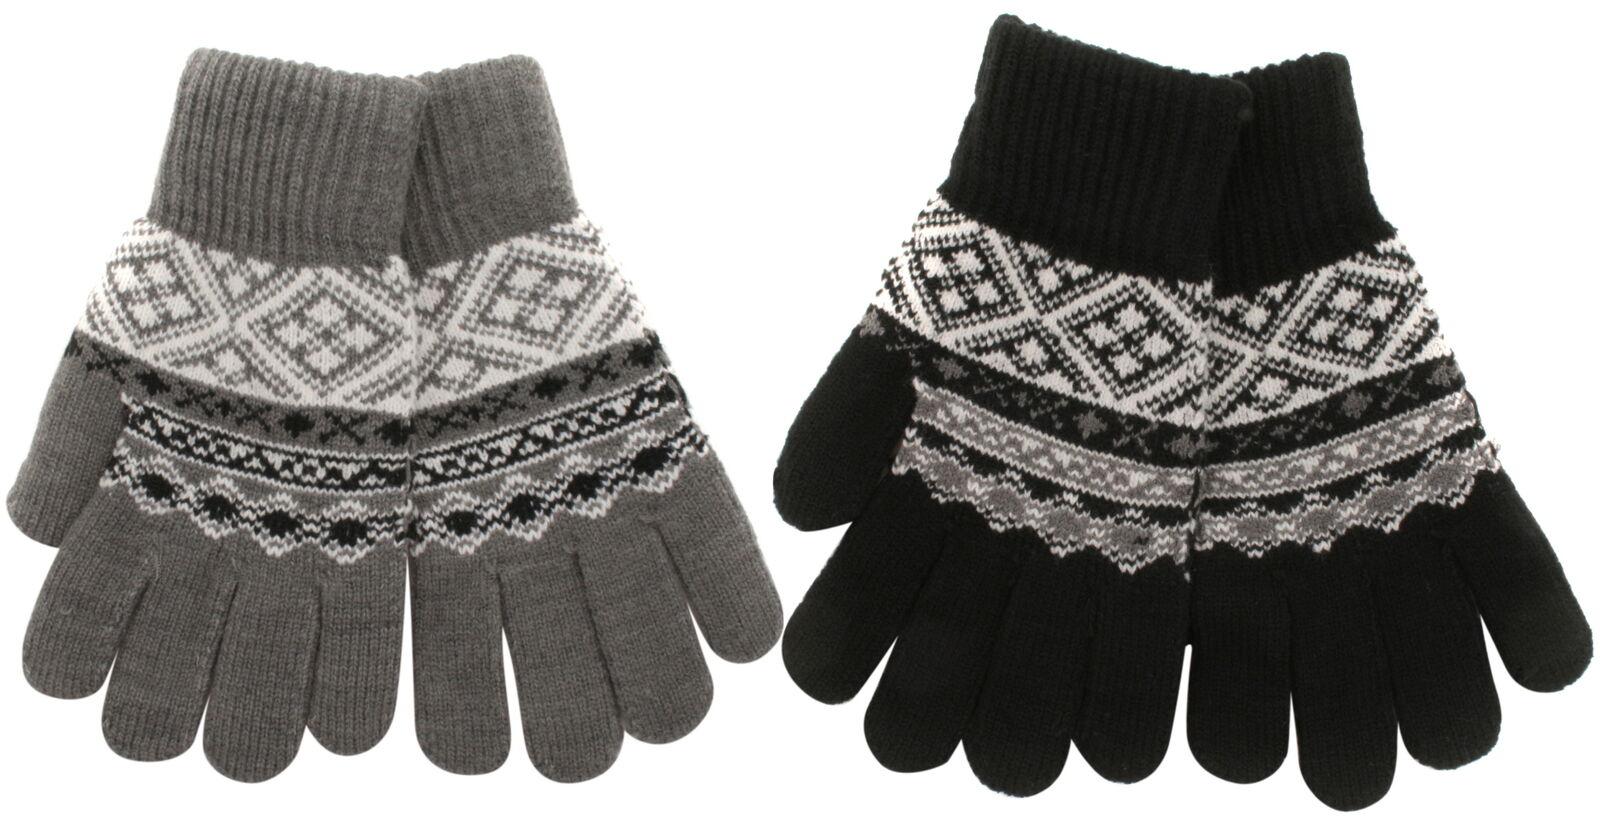 Atano Mens Fairisle Pattern Knitted Gloves